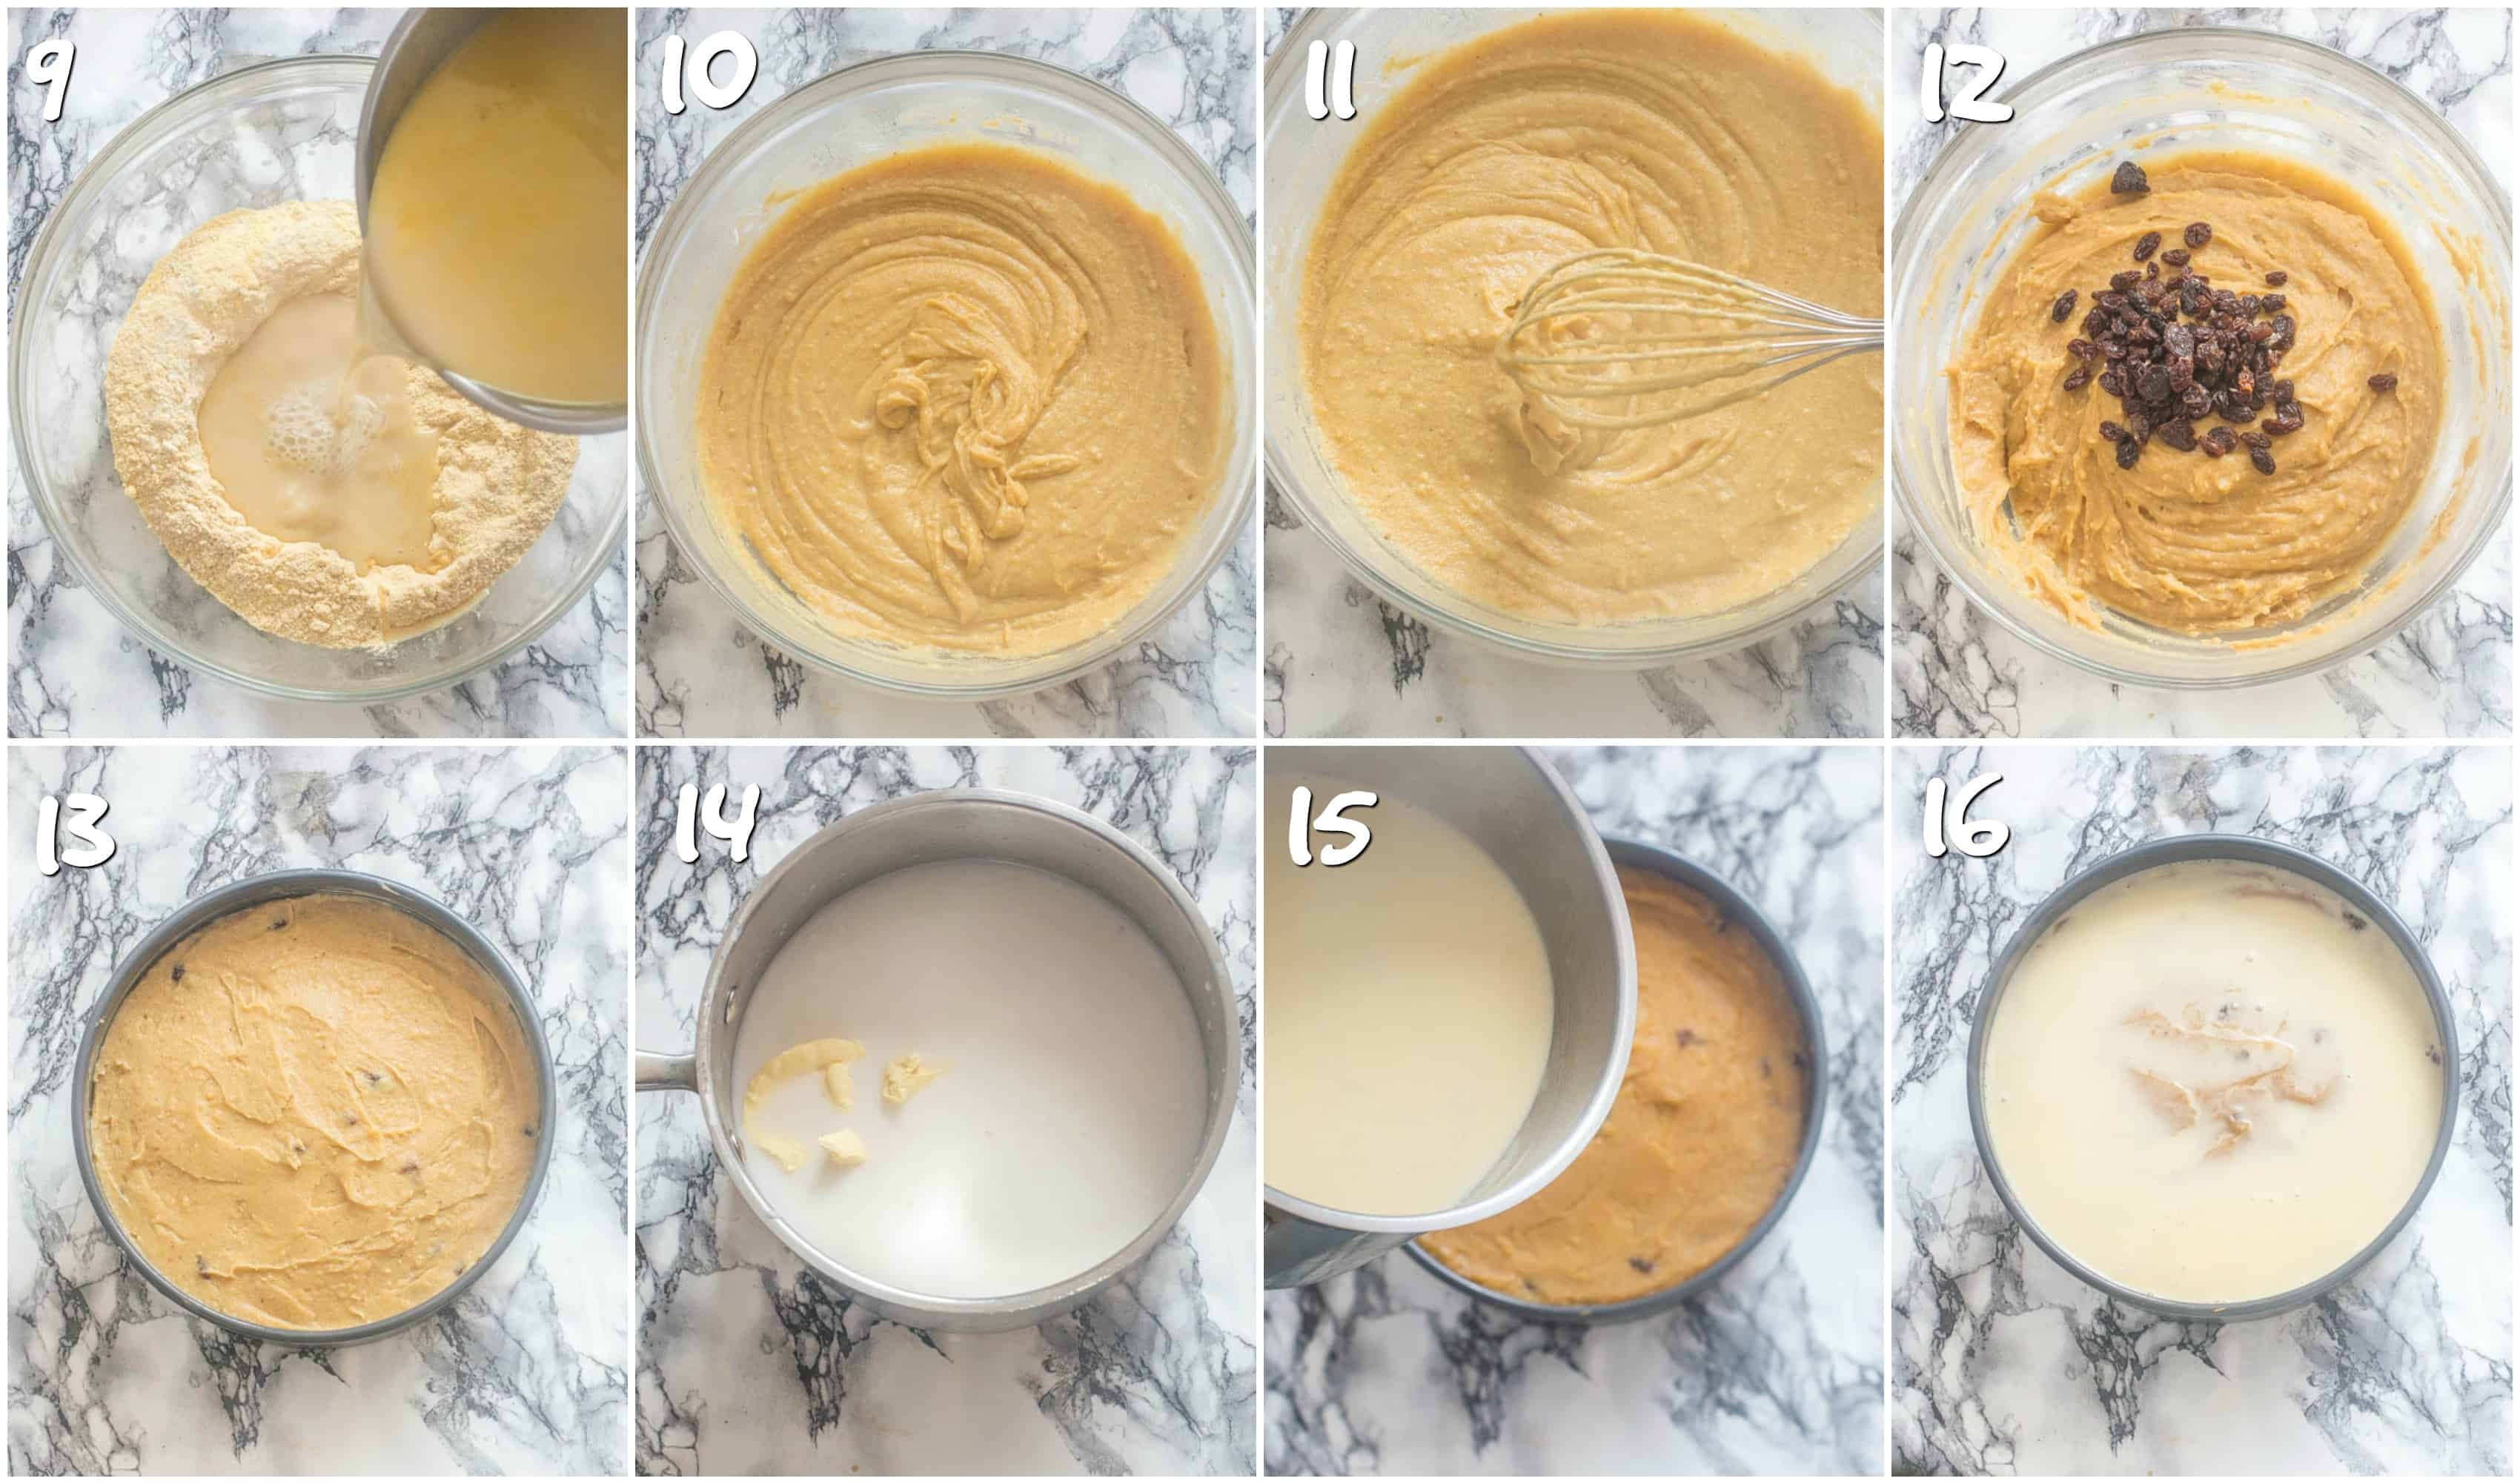 Jamaican cornmeal pudding steps 9-16